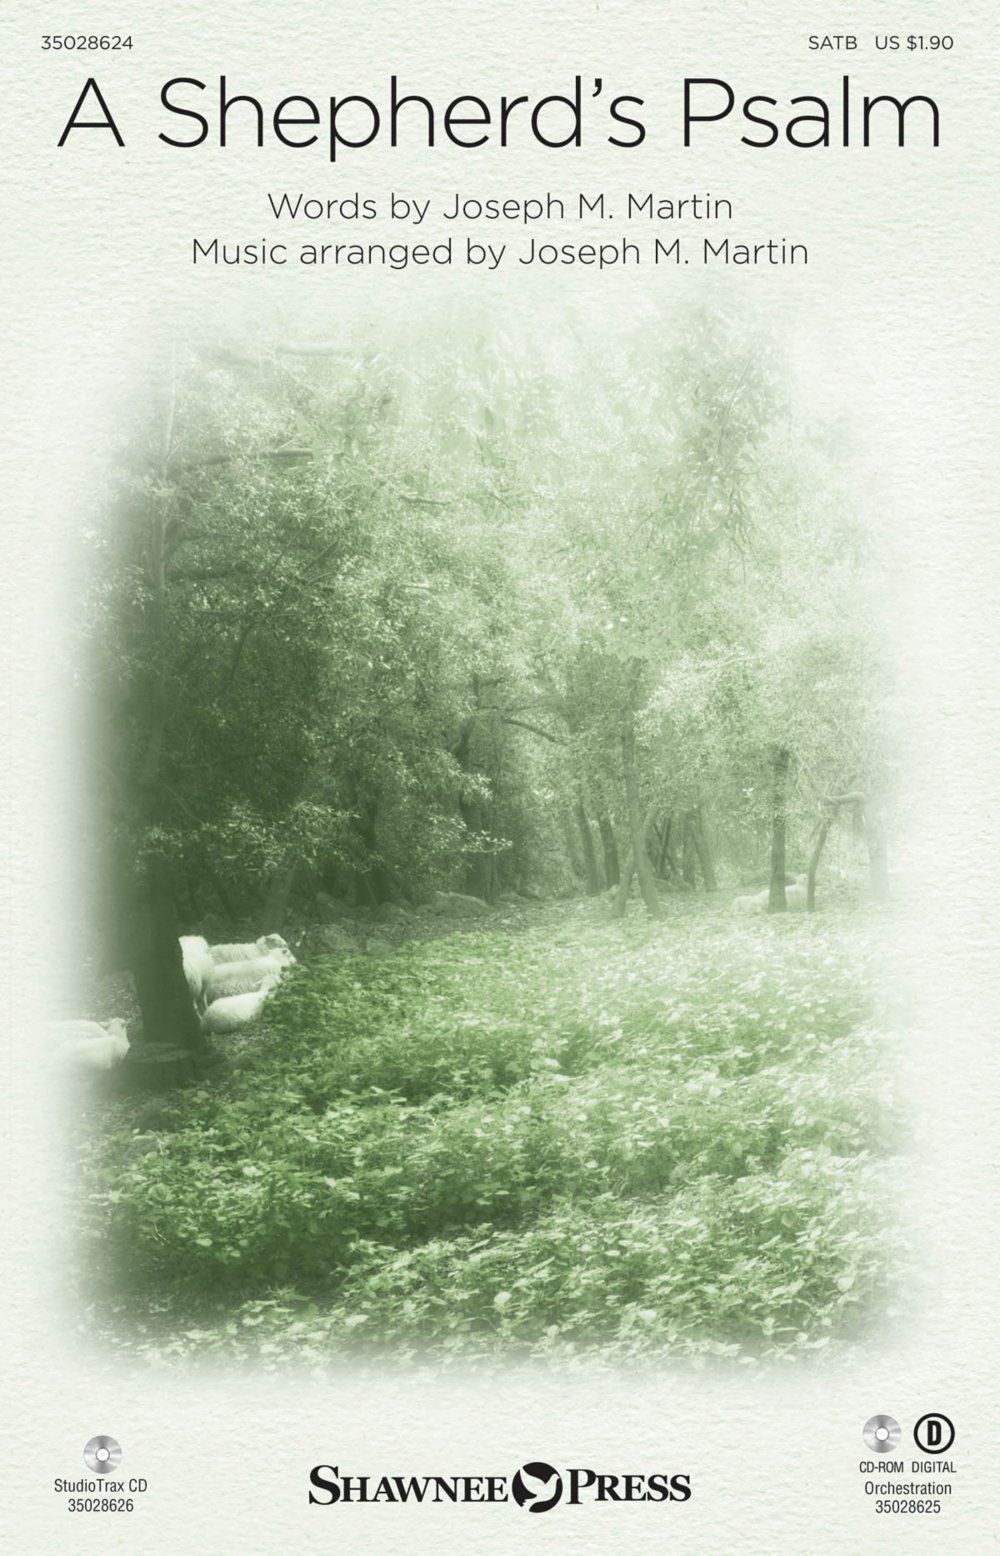 Shawnee Press A Shepherd's Psalm SATB composed by Joseph M. Martin ebook